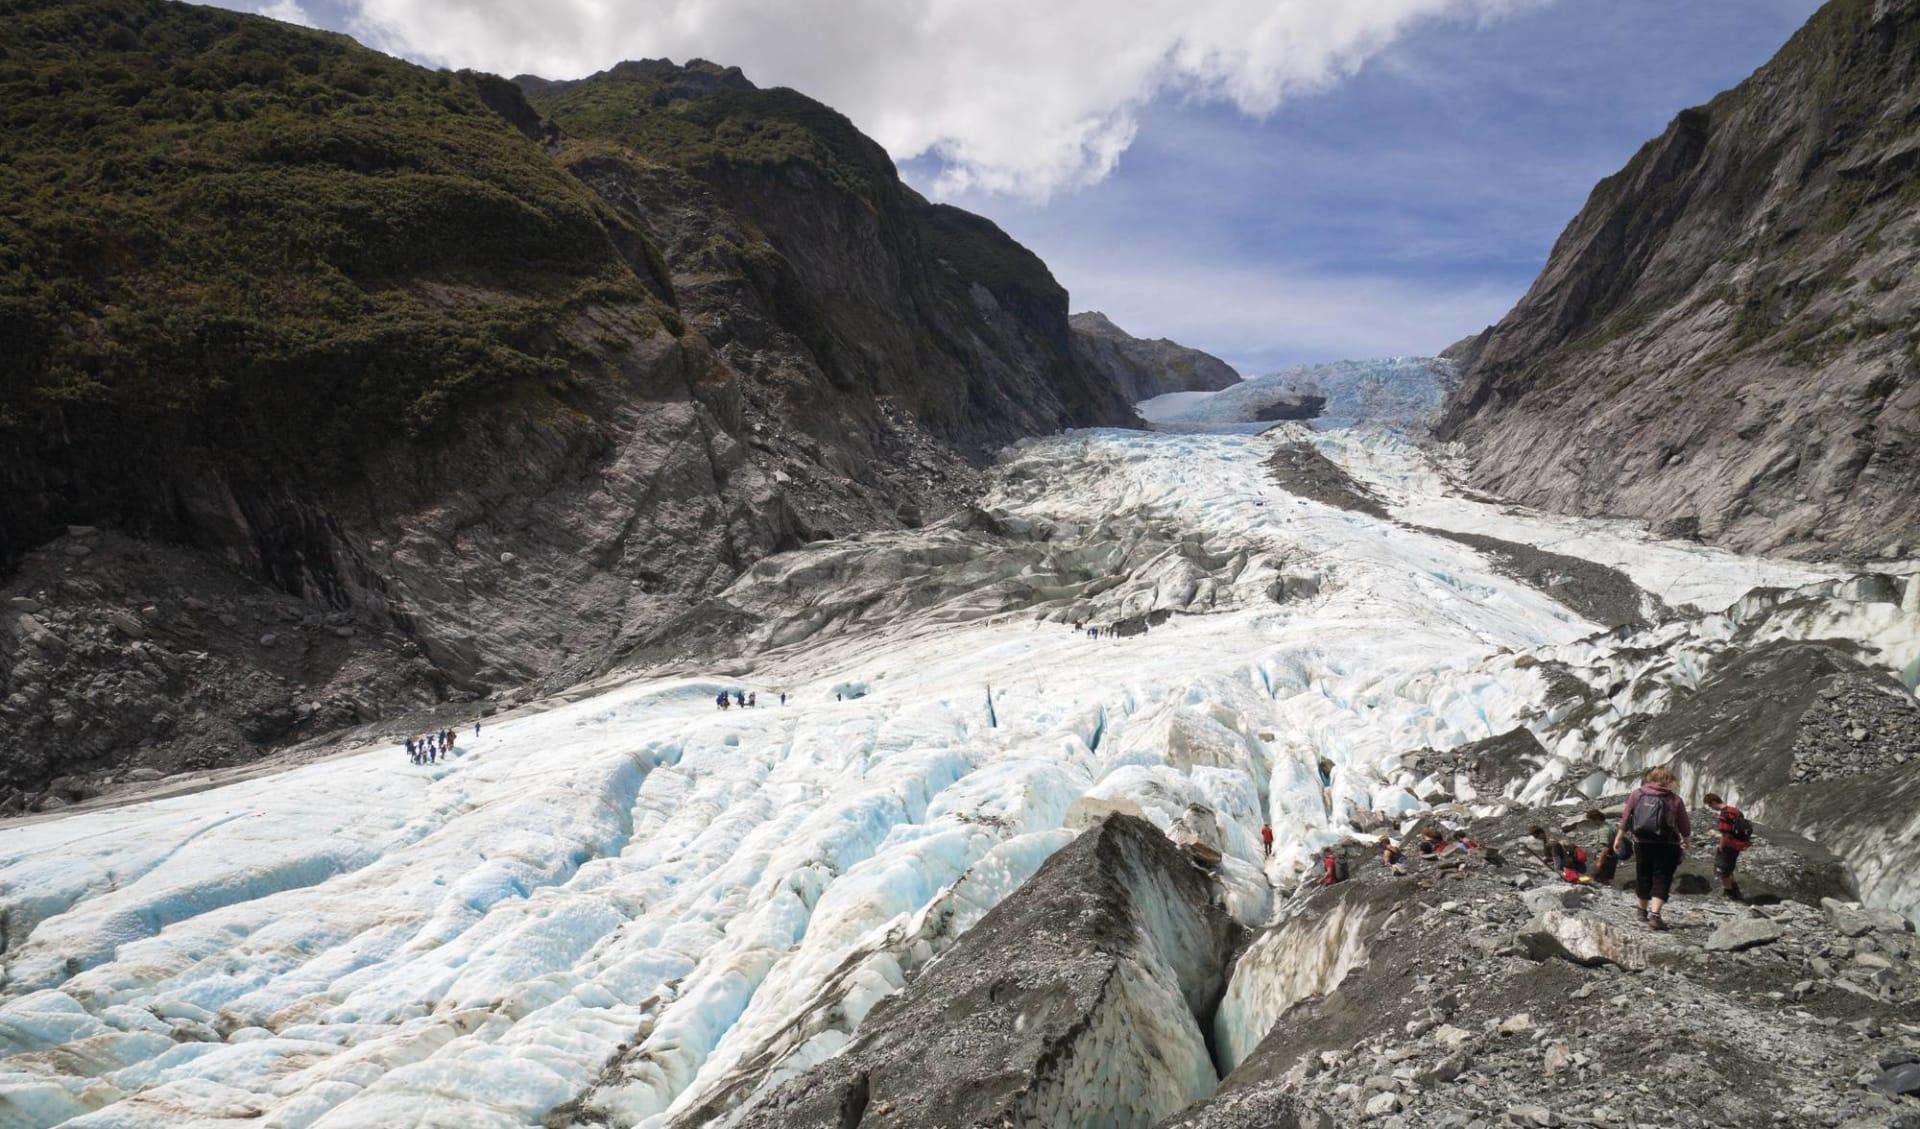 Faszination Südinsel ab Christchurch: Franz Josef - Gletscher - Eisstrom